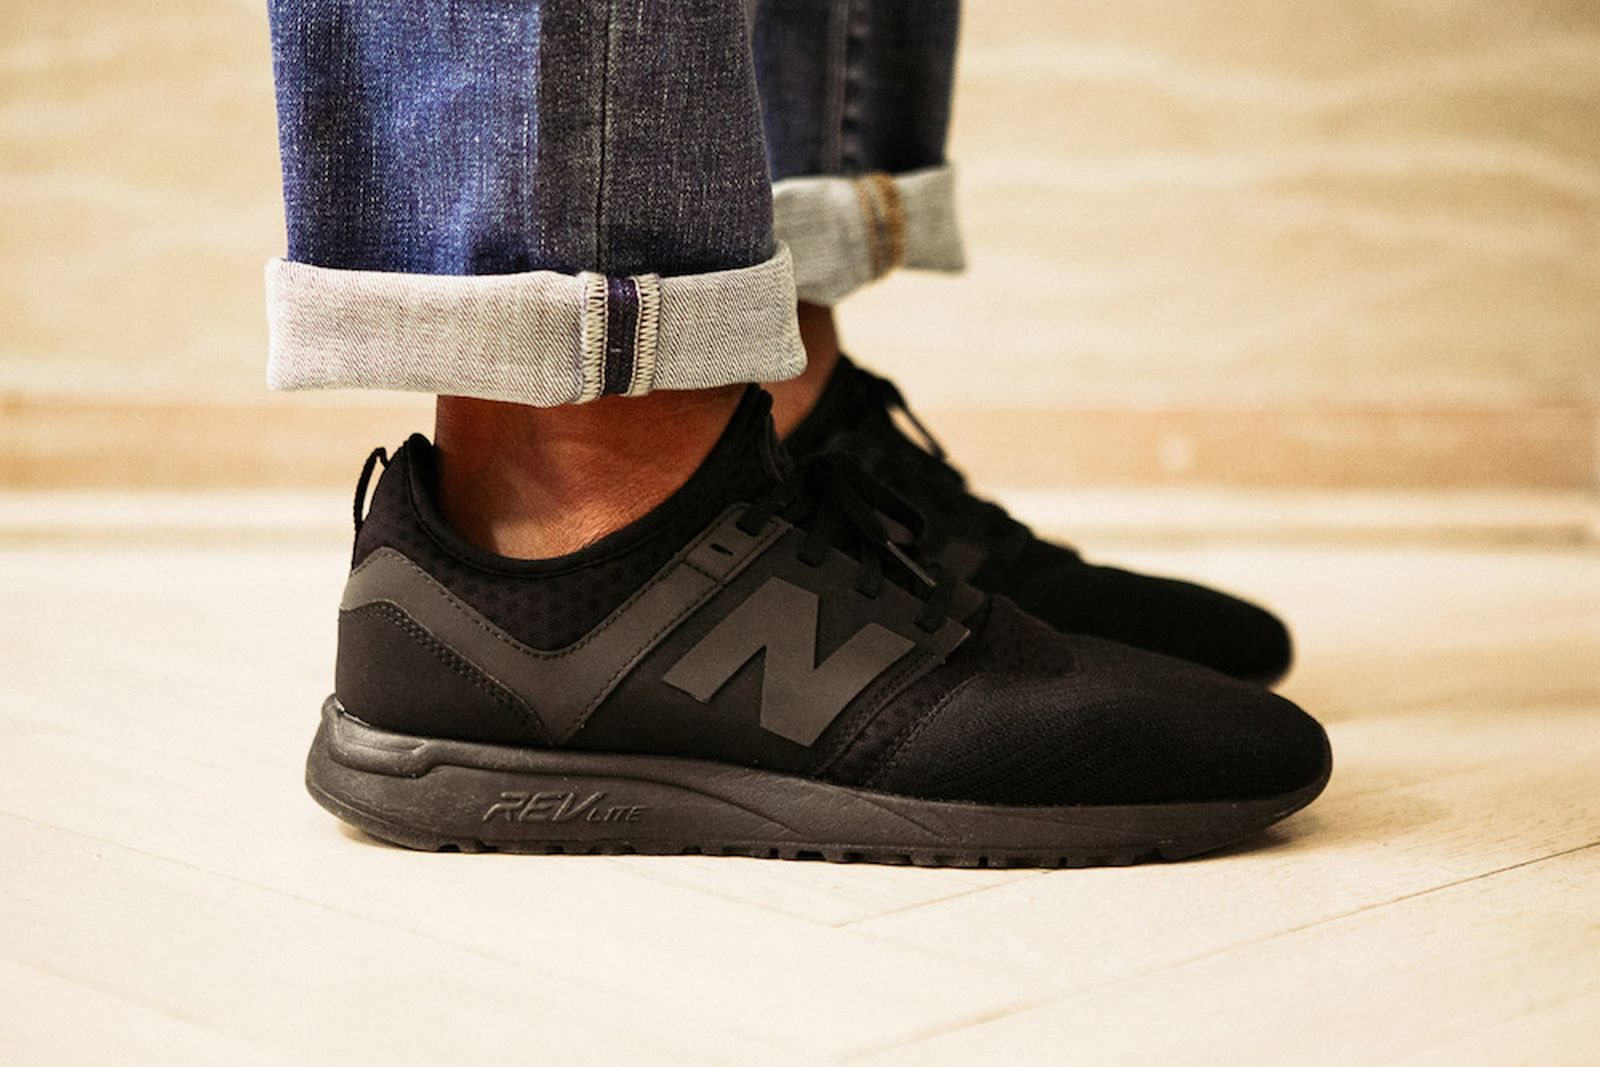 New-Balance-247-Sport-Lookbook-50